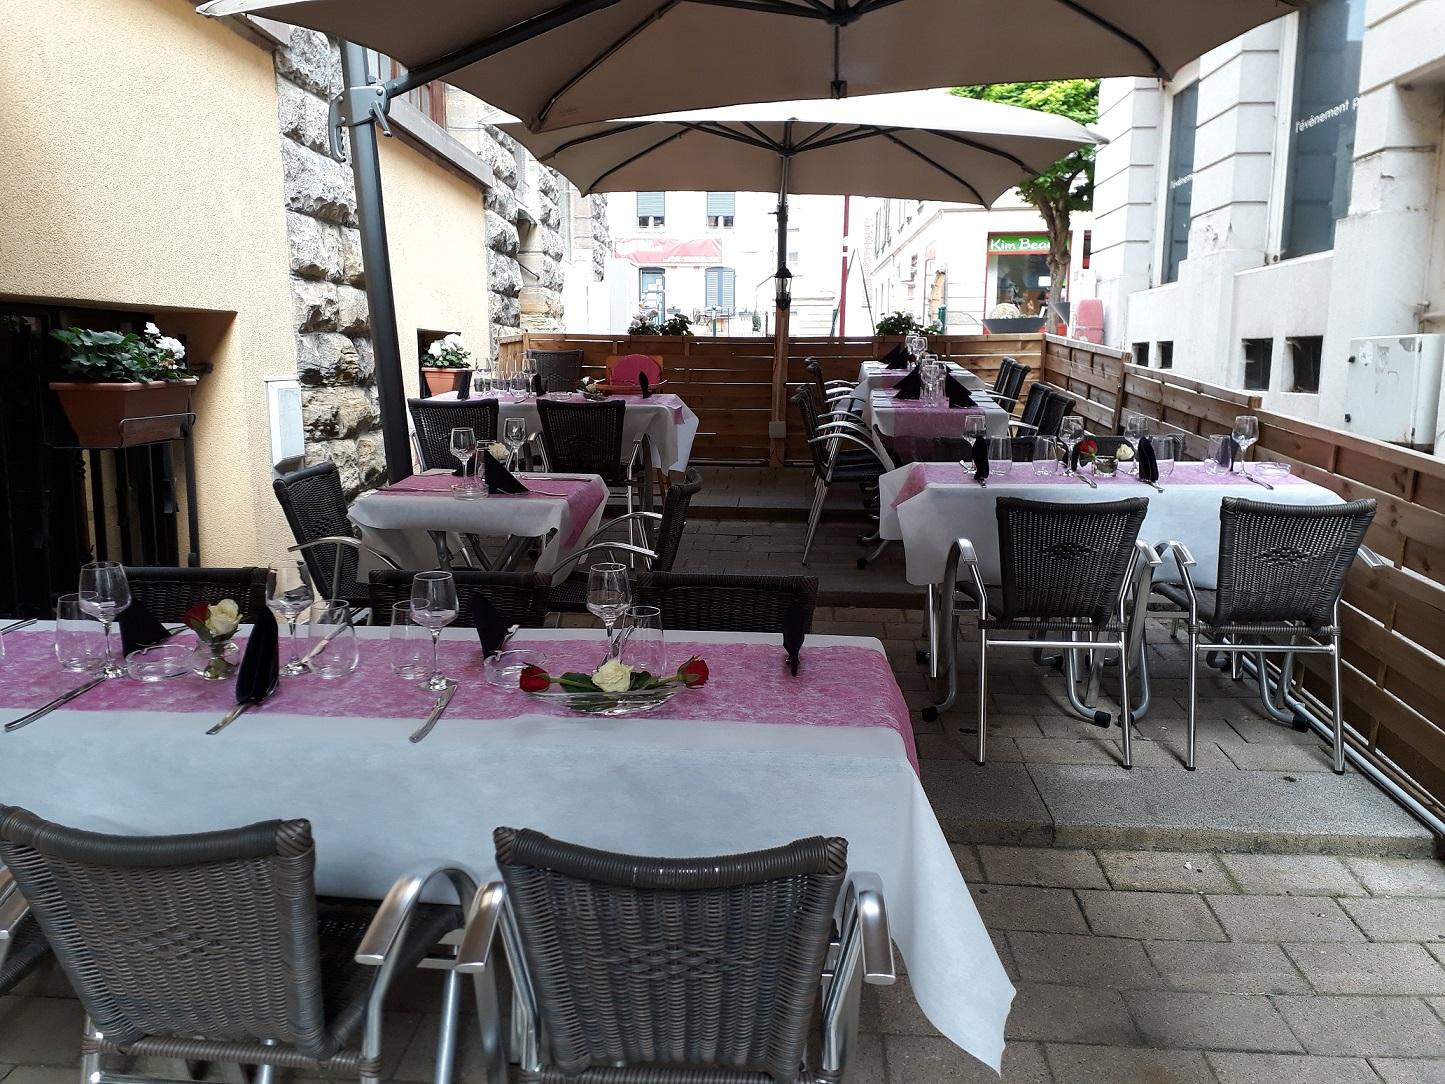 Restaurant il picchio express altkirch for Restaurant altkirch